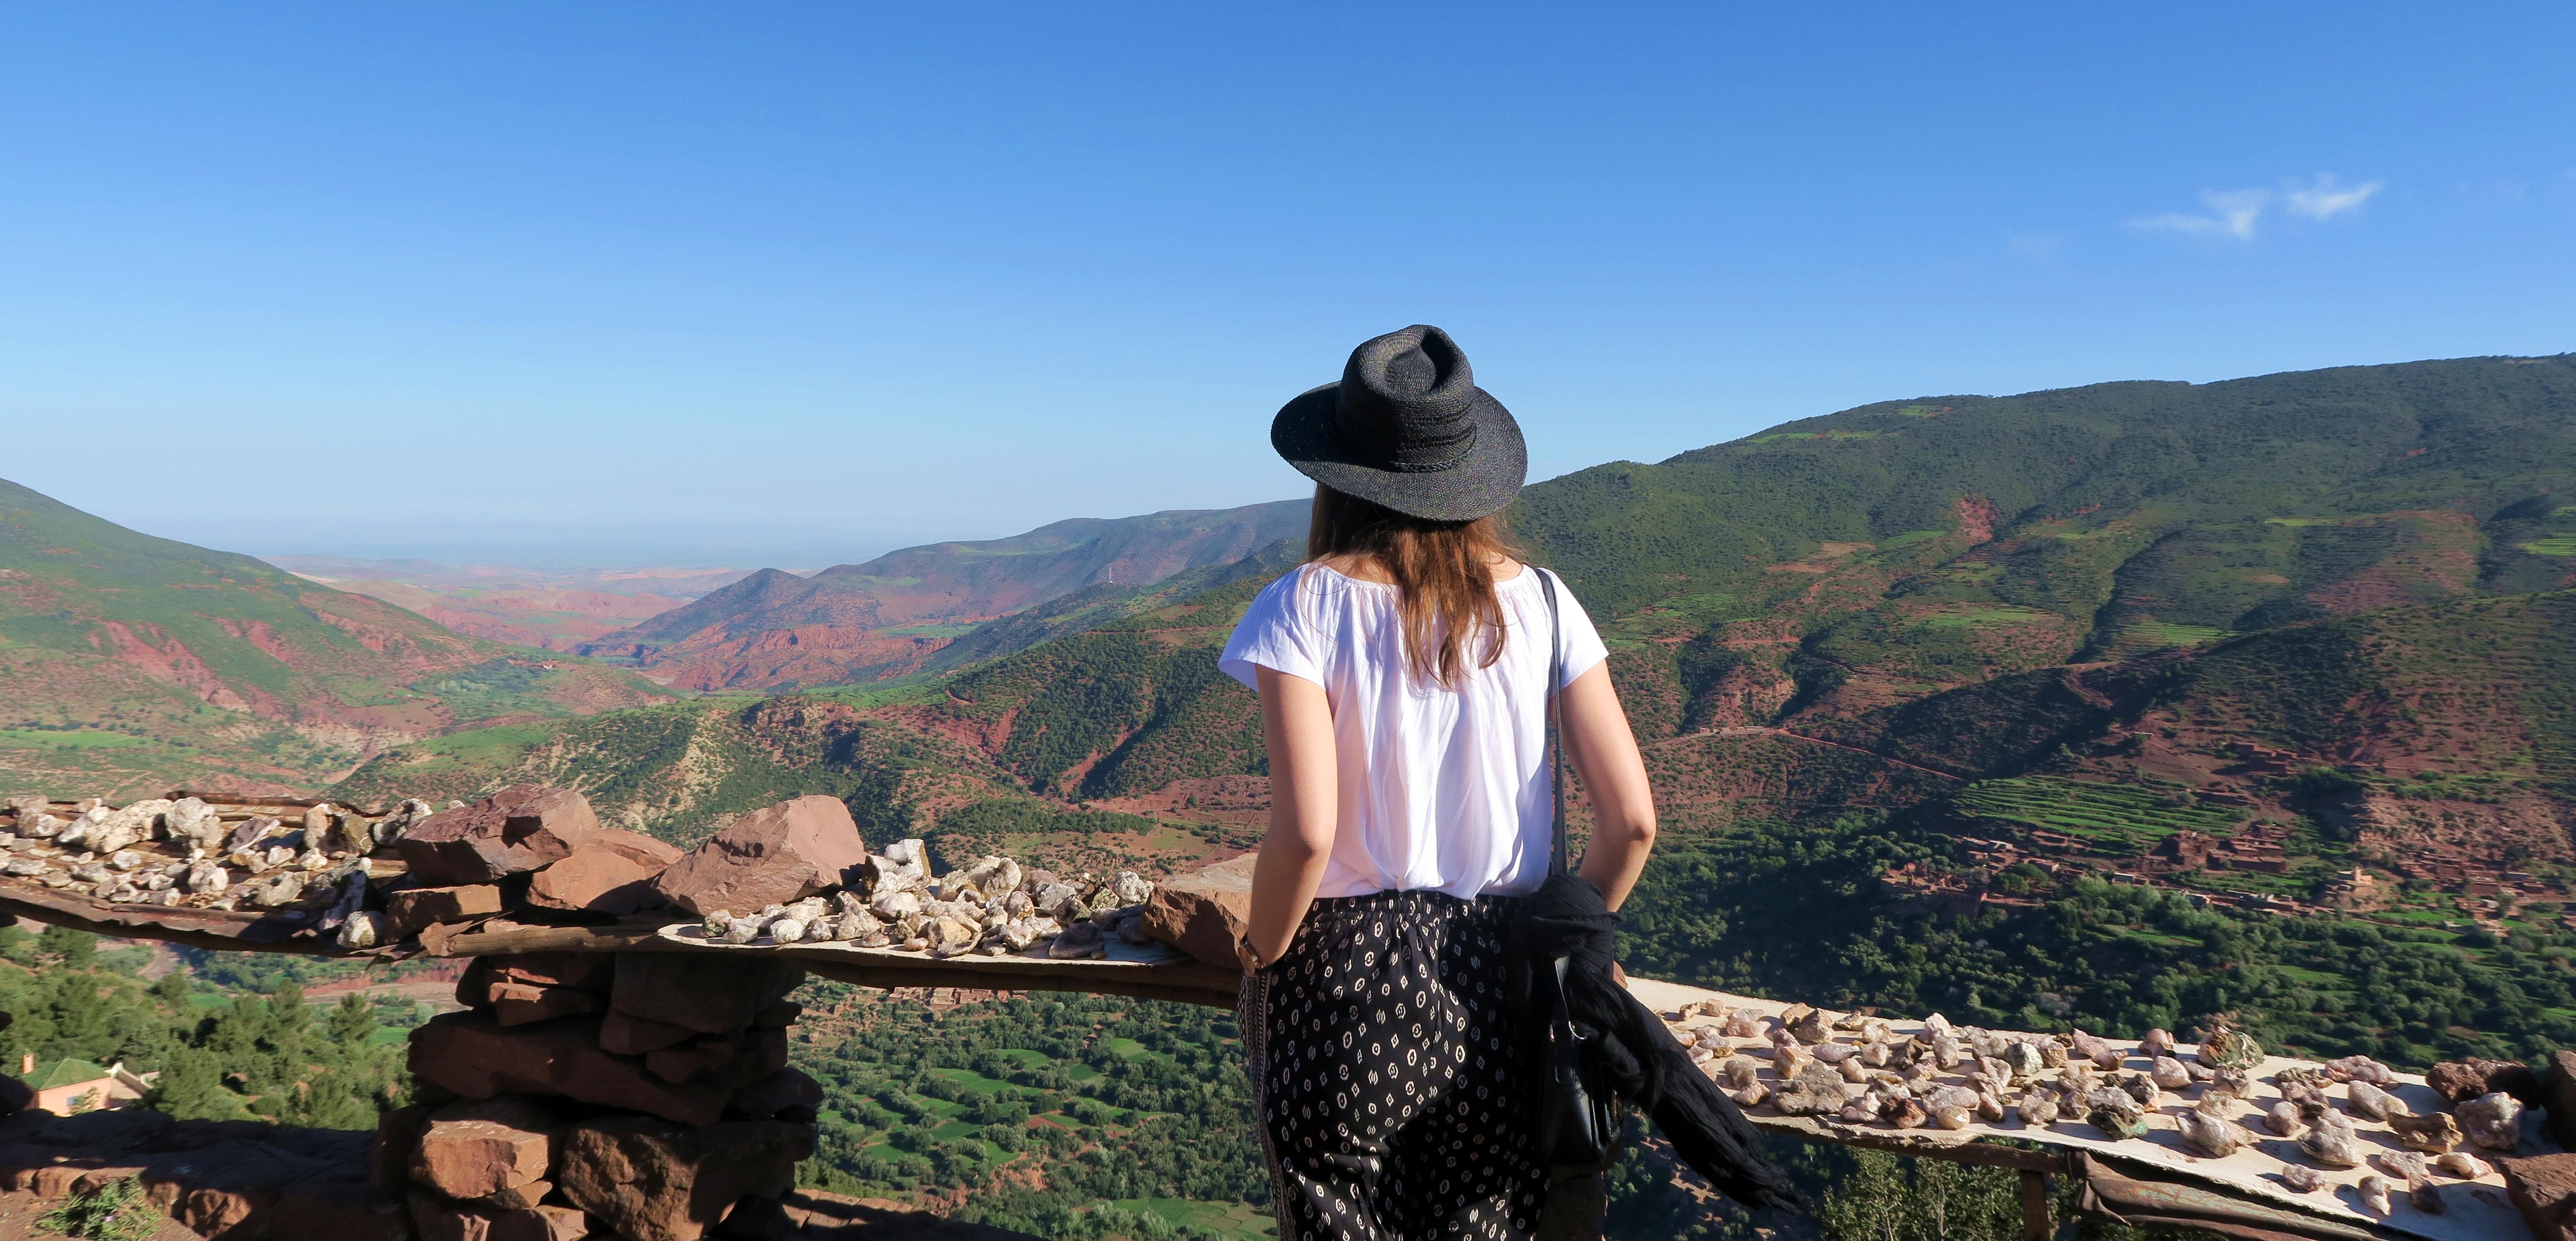 Atlas Mountains Girl Scenery